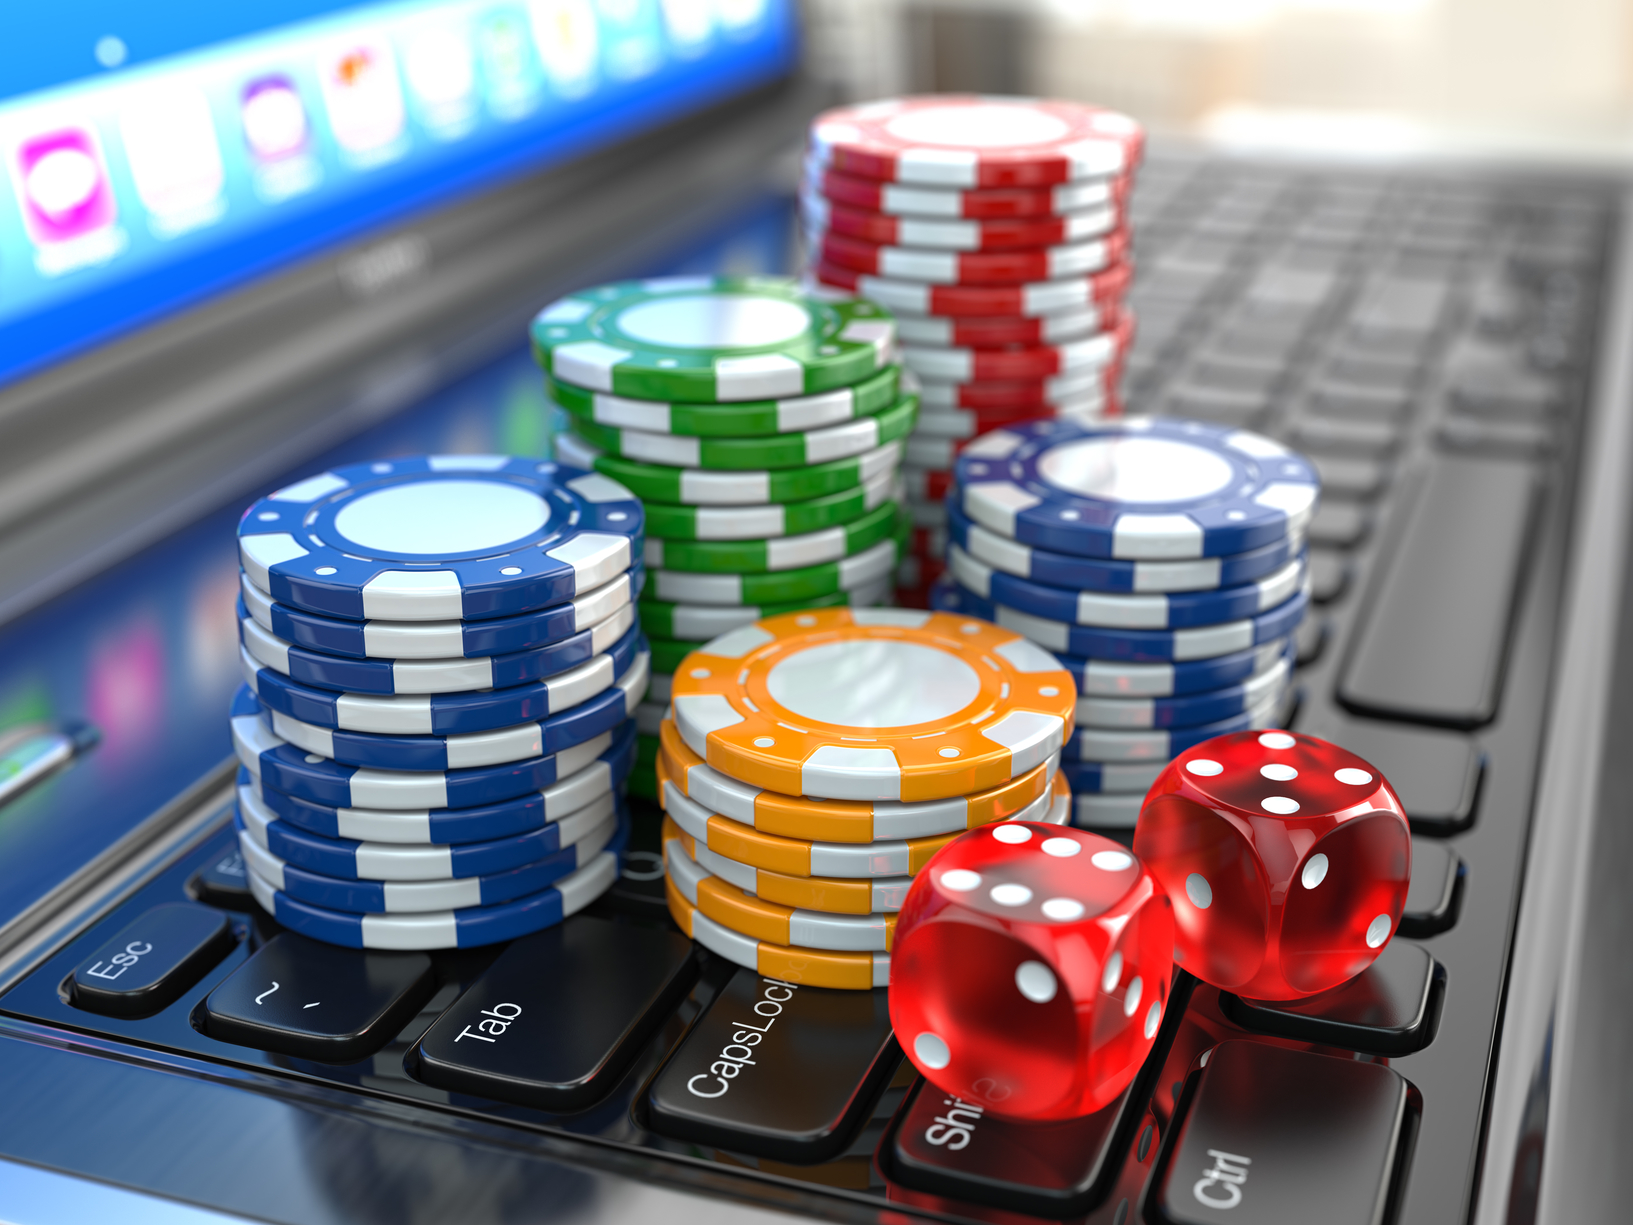 Photo to illustrate article https://www.lkshields.ie/images/uploads/news/online_gambling.jpg.